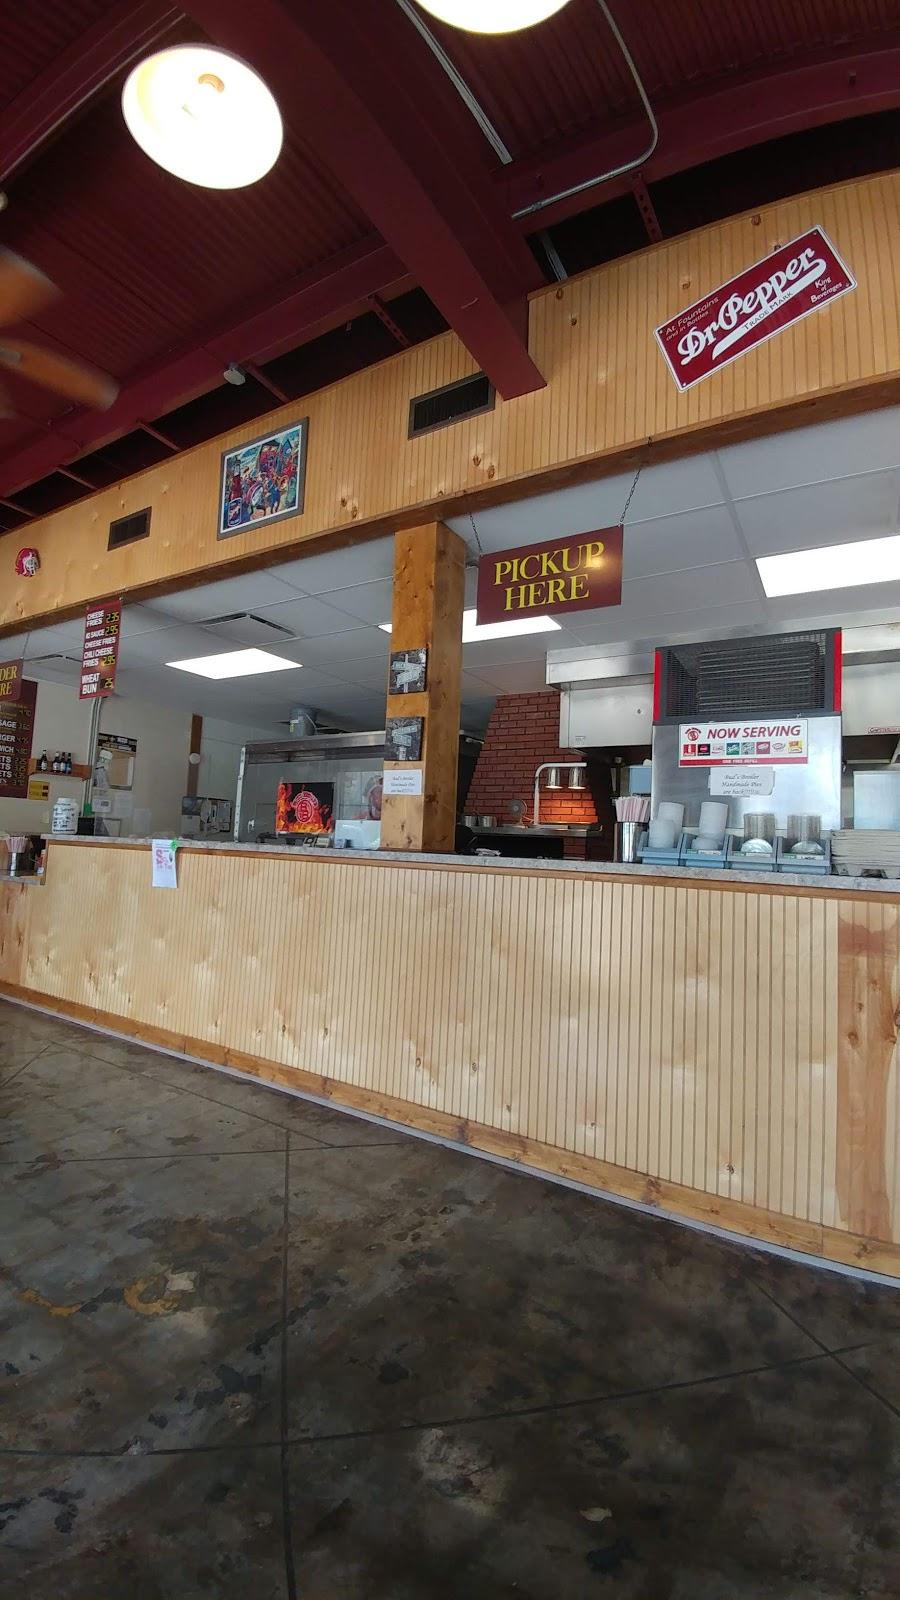 Dunkin - bakery  | Photo 13 of 15 | Address: 61 Main St, Salisbury, MA 01952, USA | Phone: (978) 462-1189